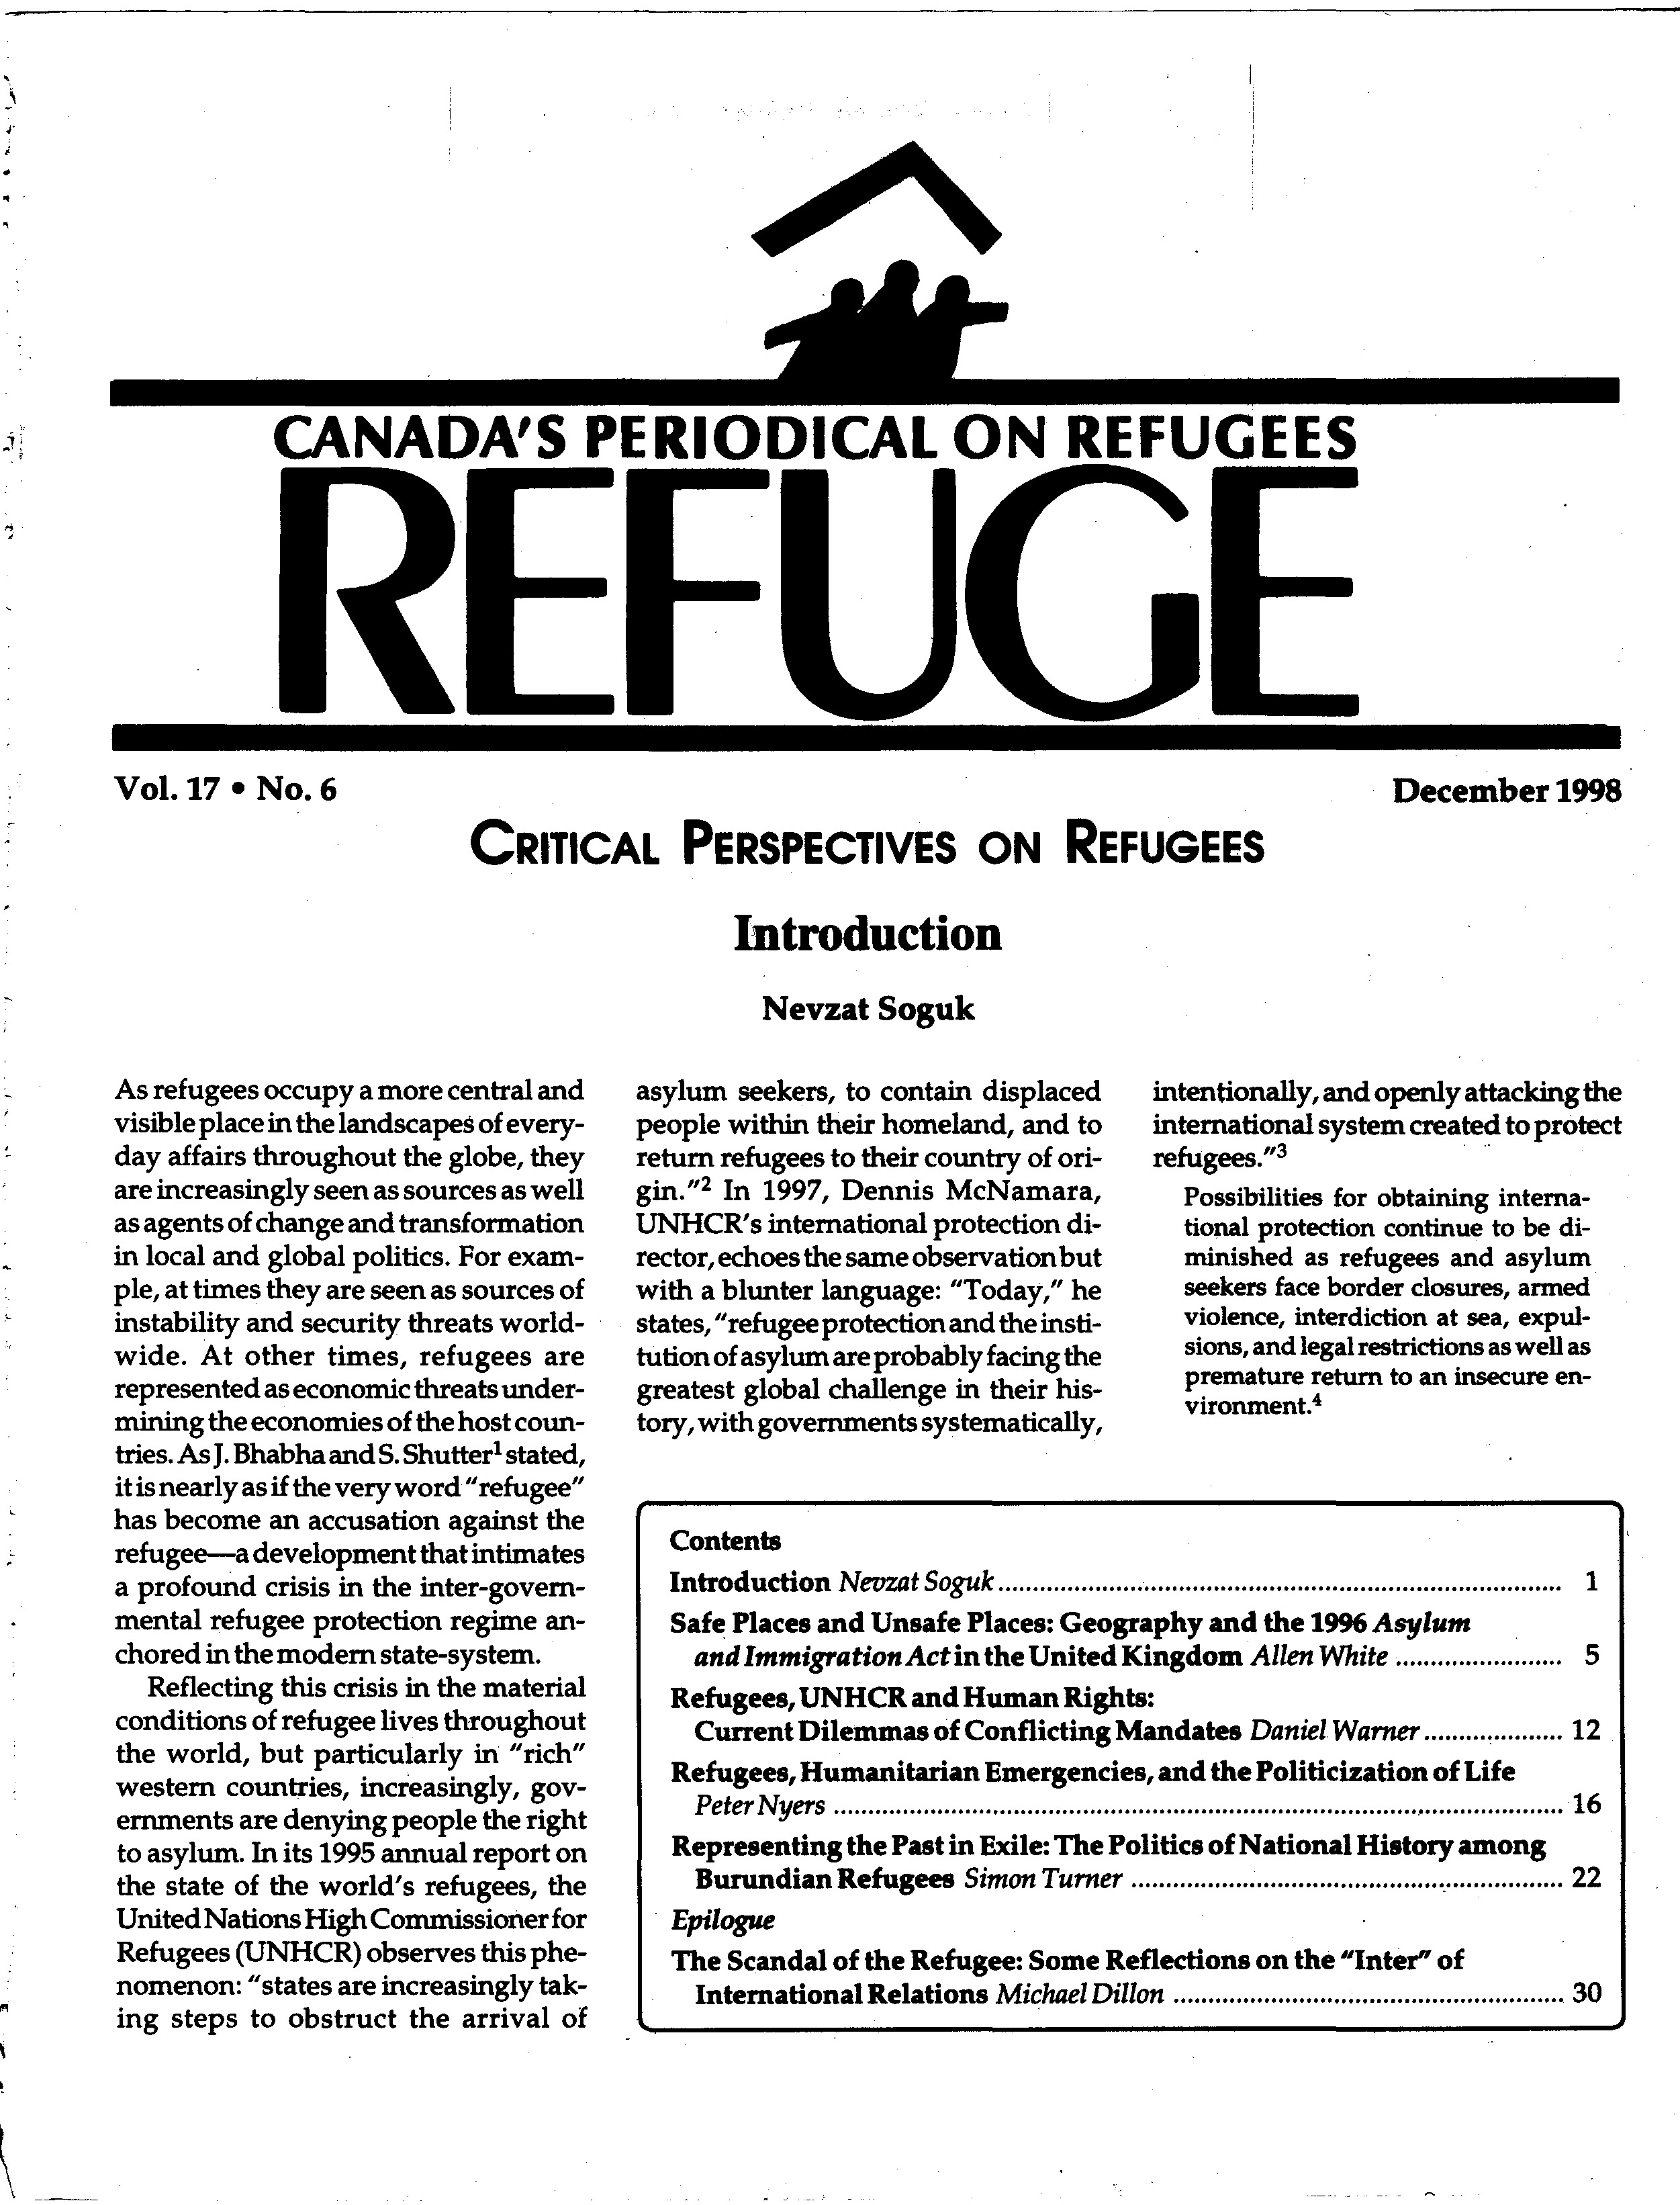 first page Refuge vol. 17.6 1998